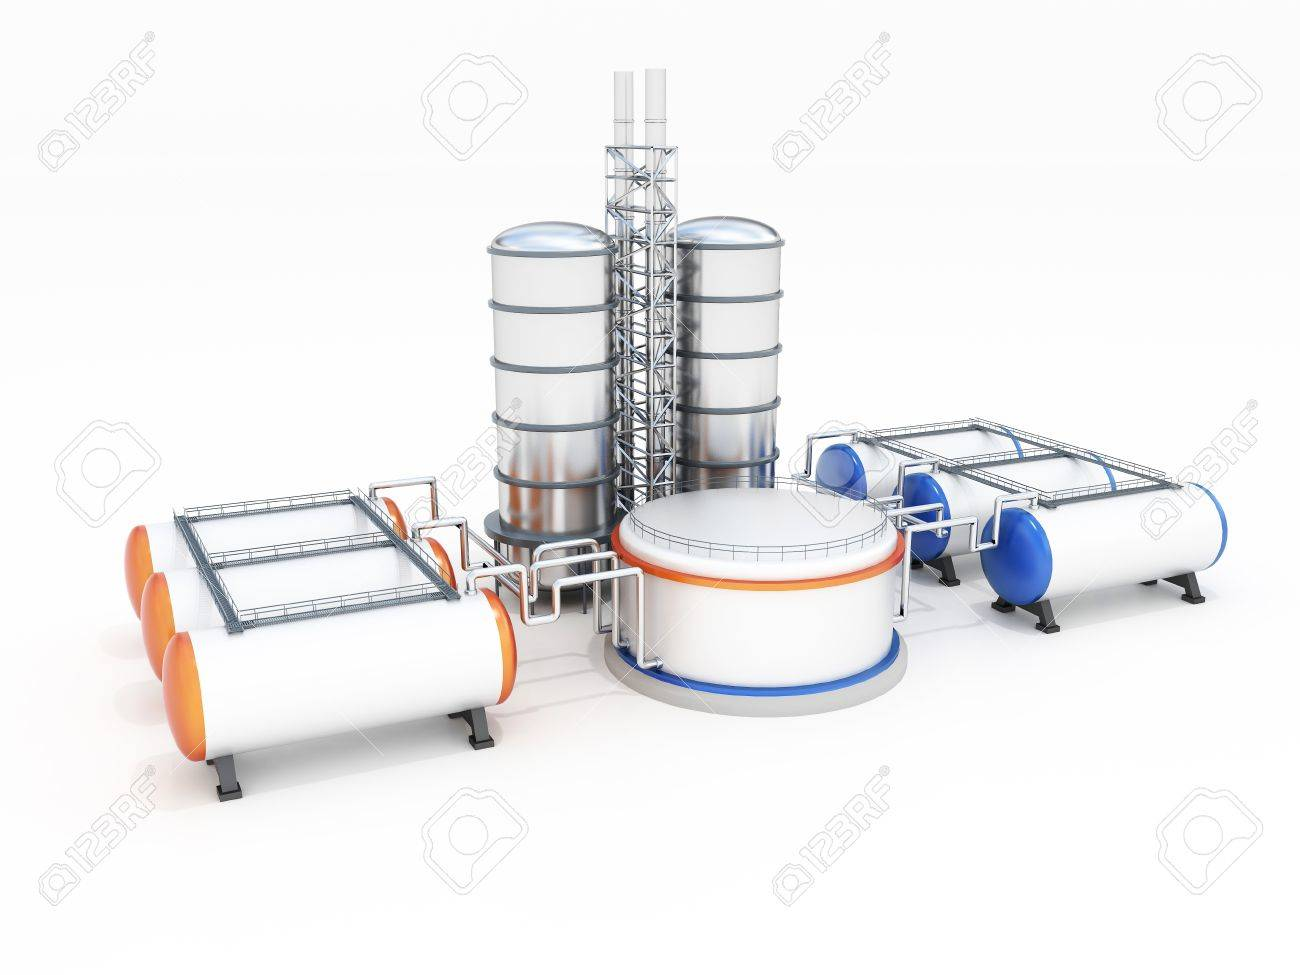 3d model of oil factory Stock Photo - 17456740